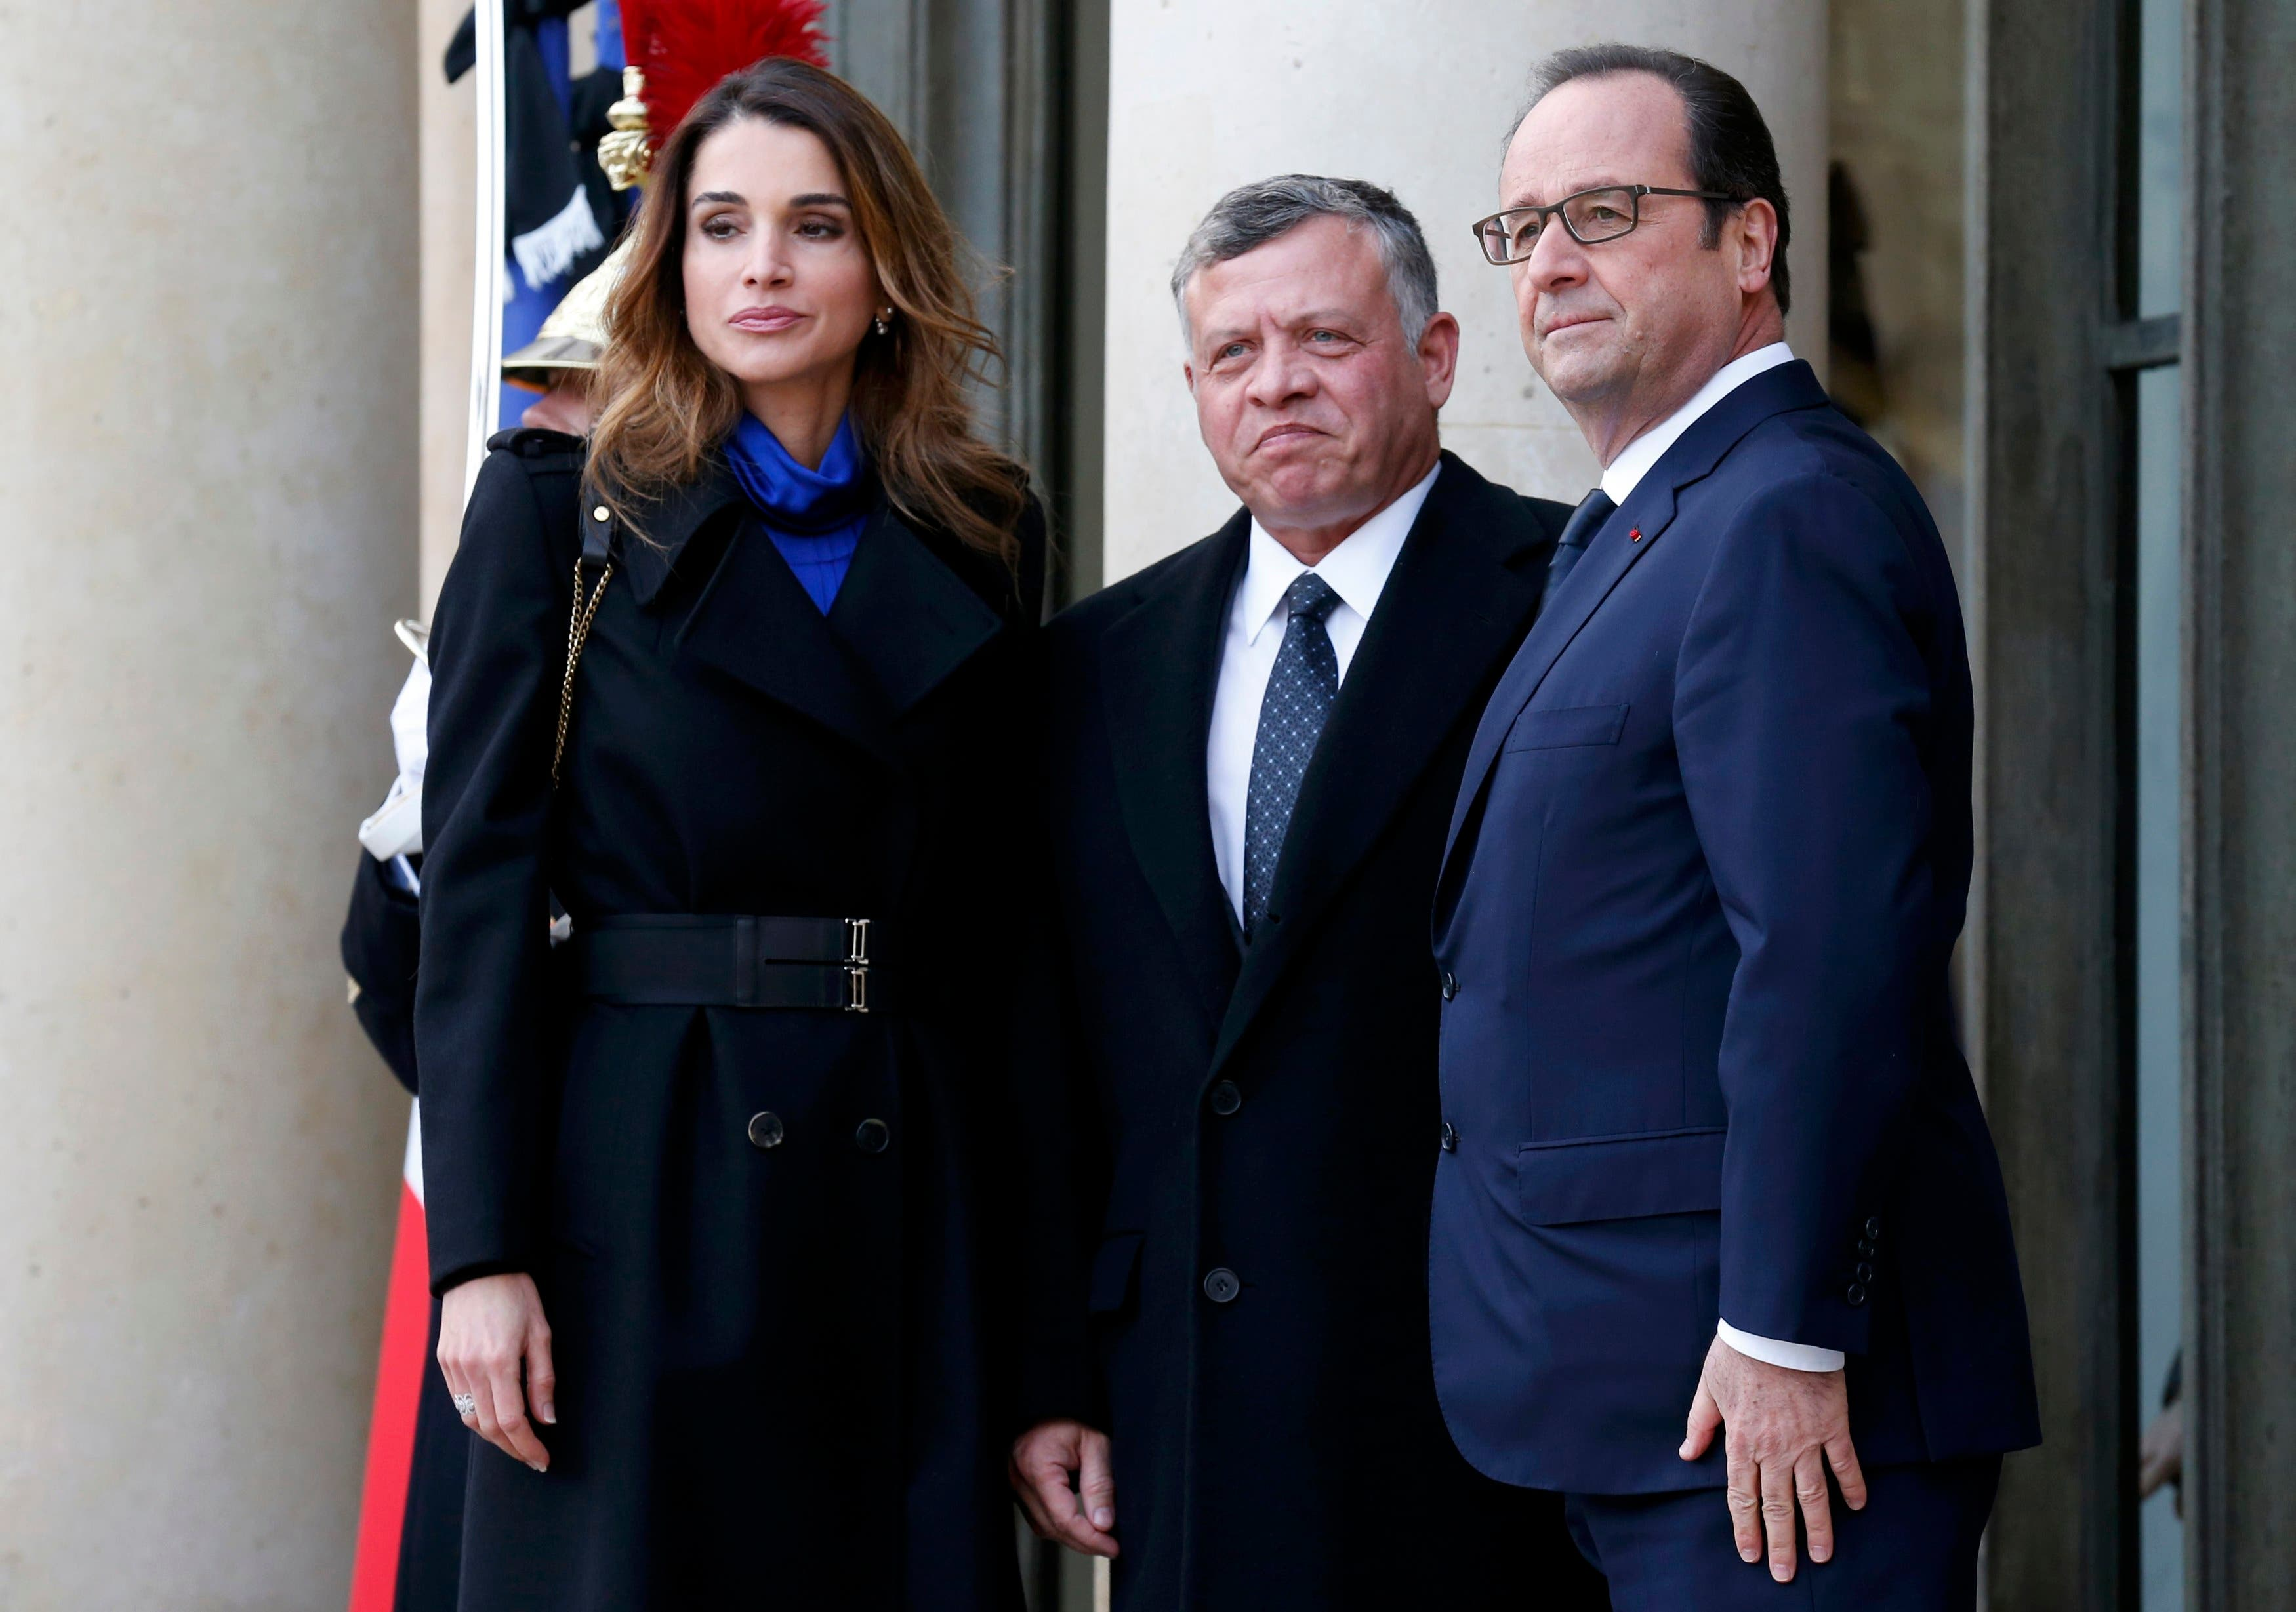 World leaders join Paris solidarity rally